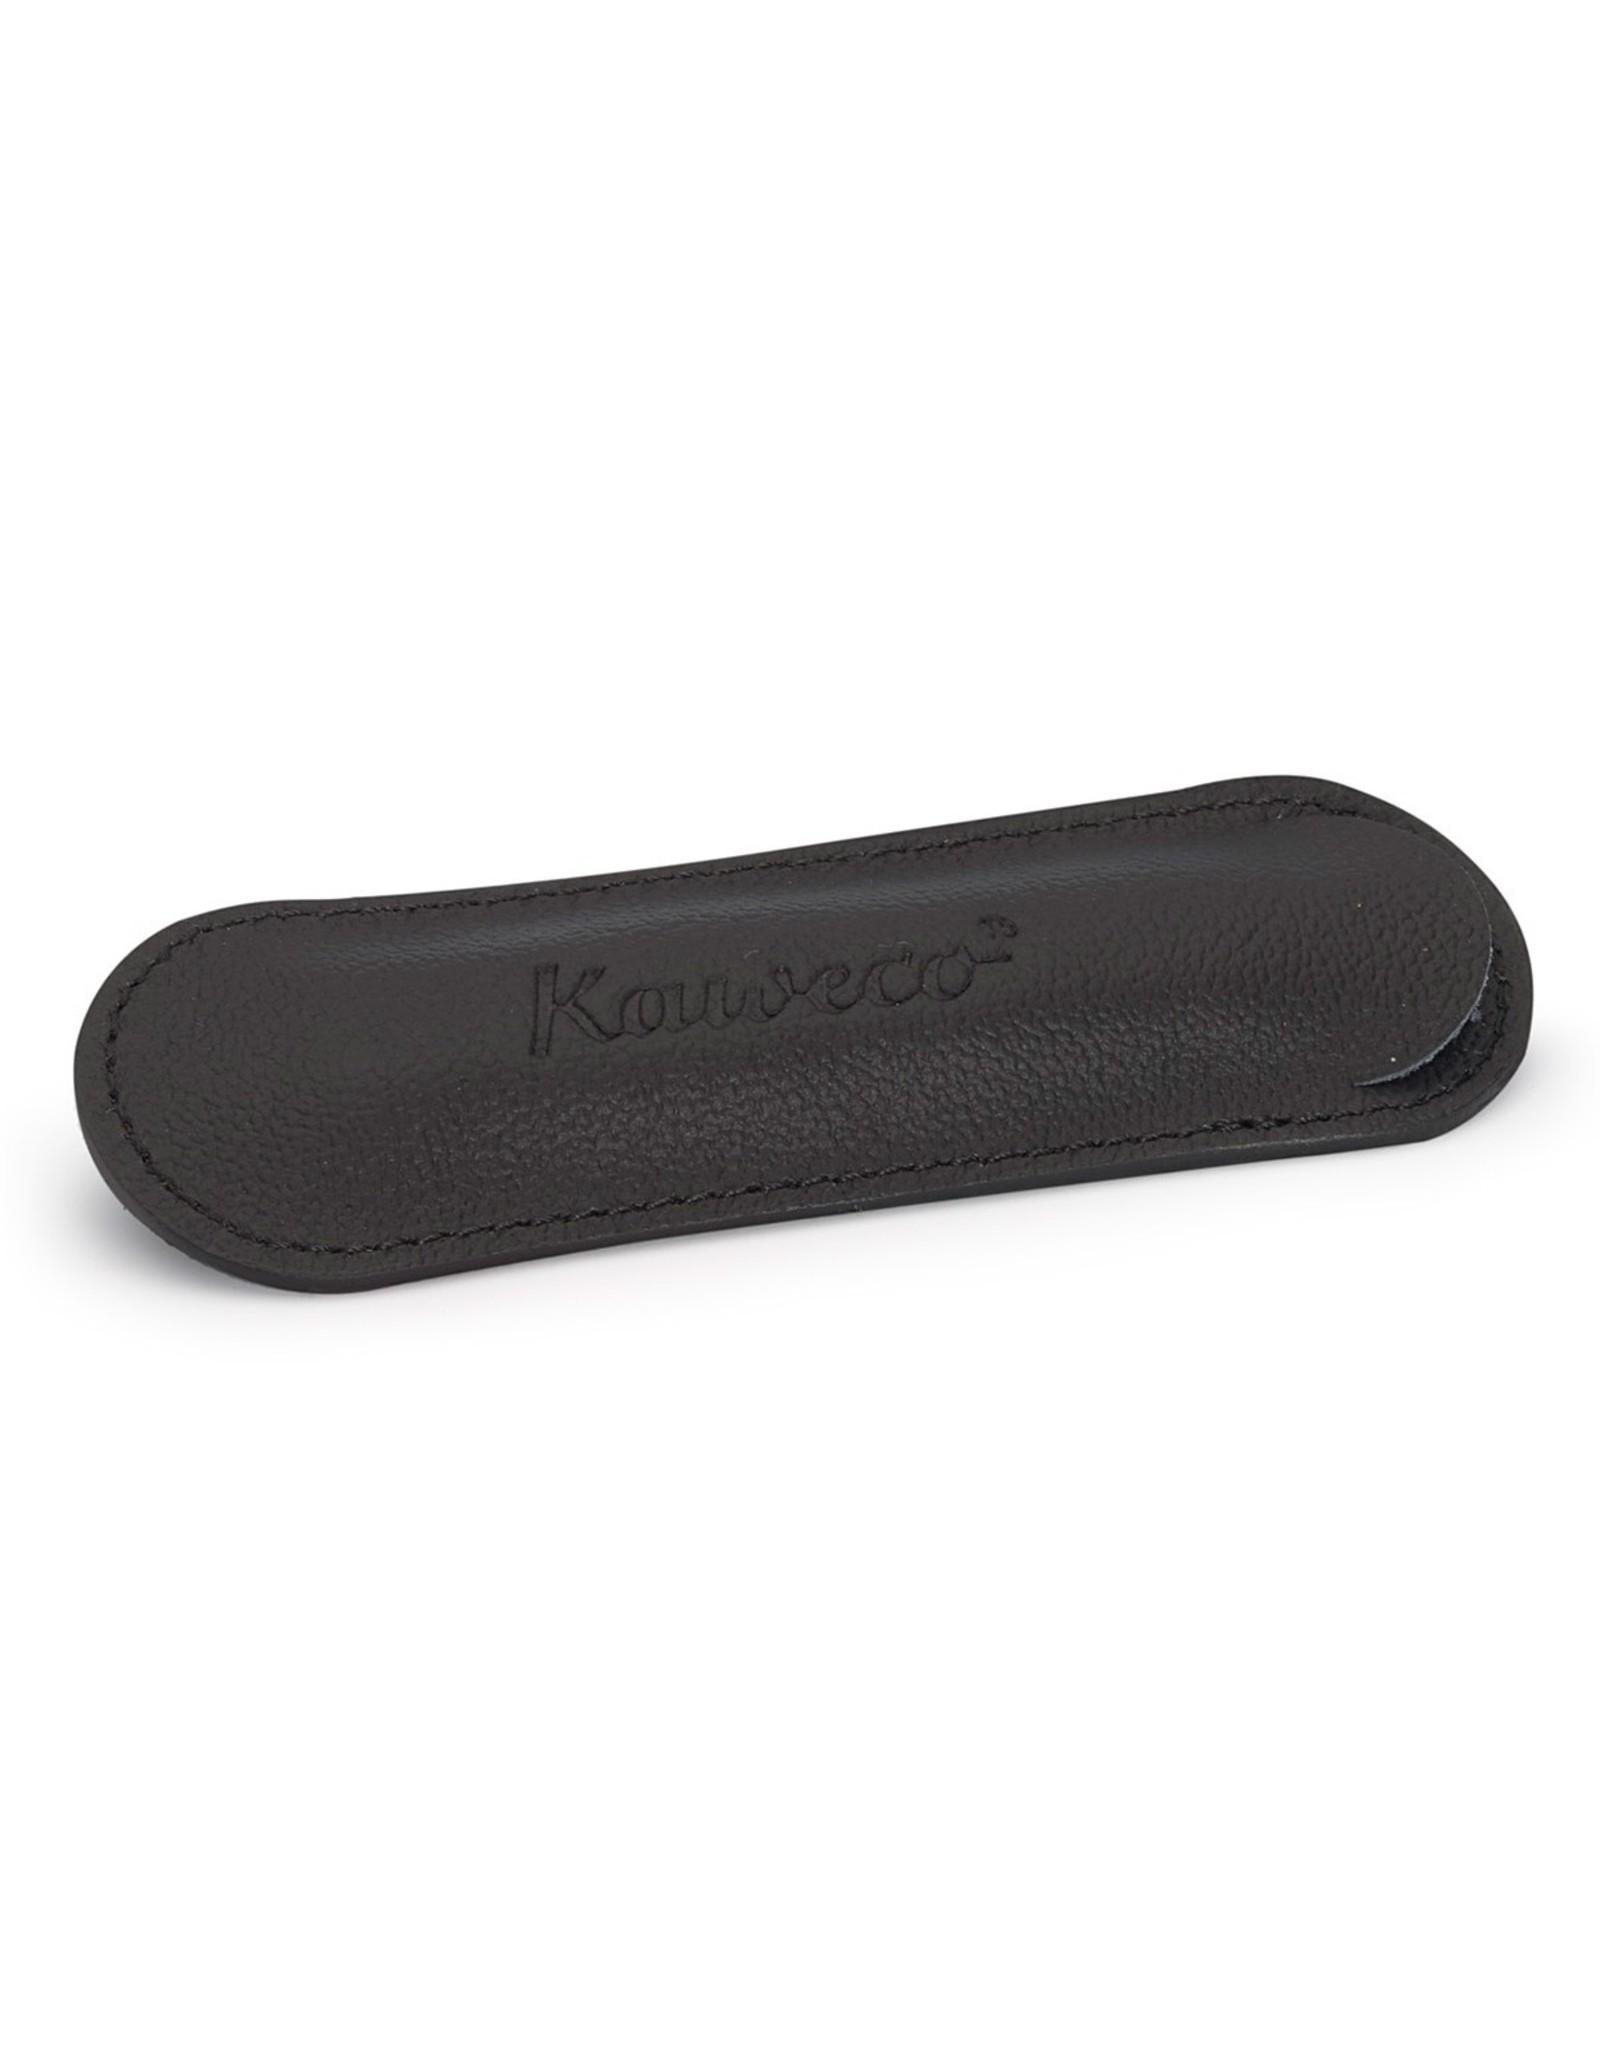 Kaweco Kaweco | Eco Pouch | 1 Pen | Black